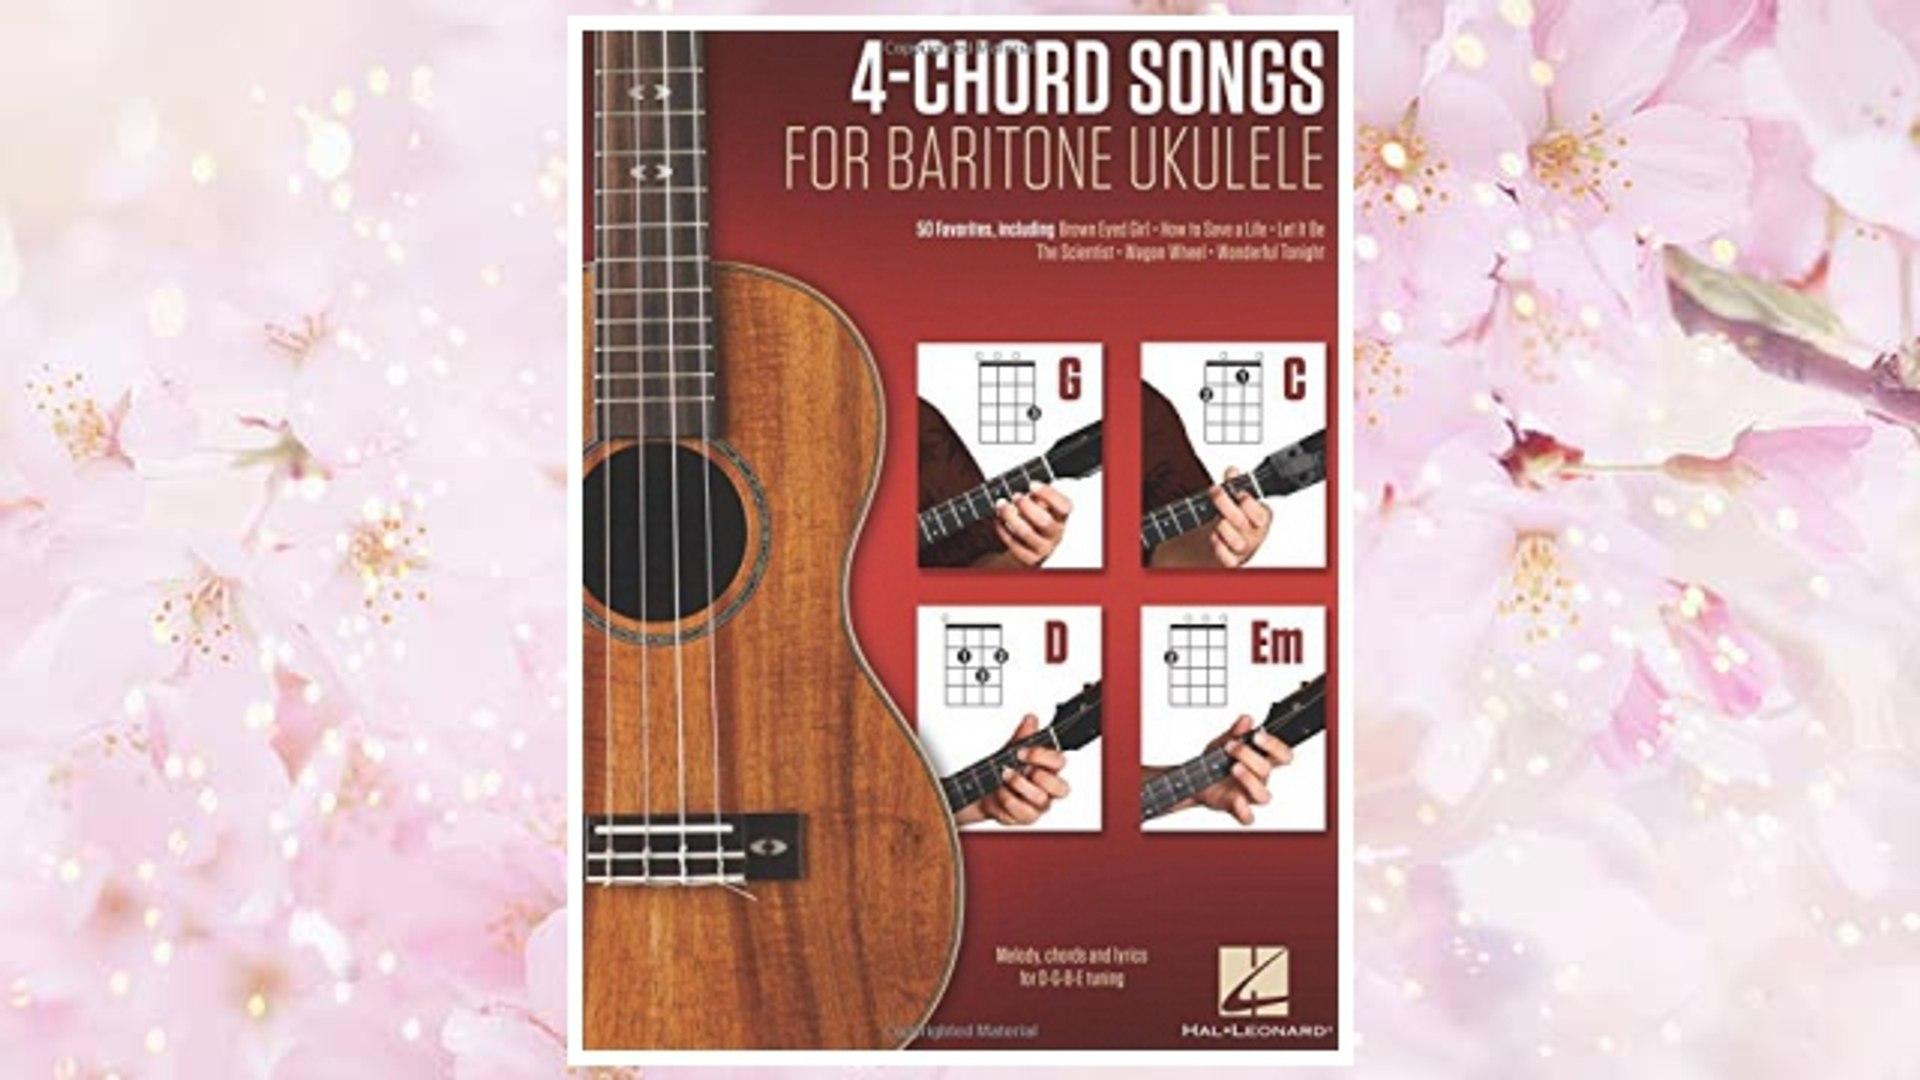 Download PDF 4-Chord Songs for Baritone Ukulele (G-C-D-Em): Melody, Chords and Lyrics for D-G-B-E Tu